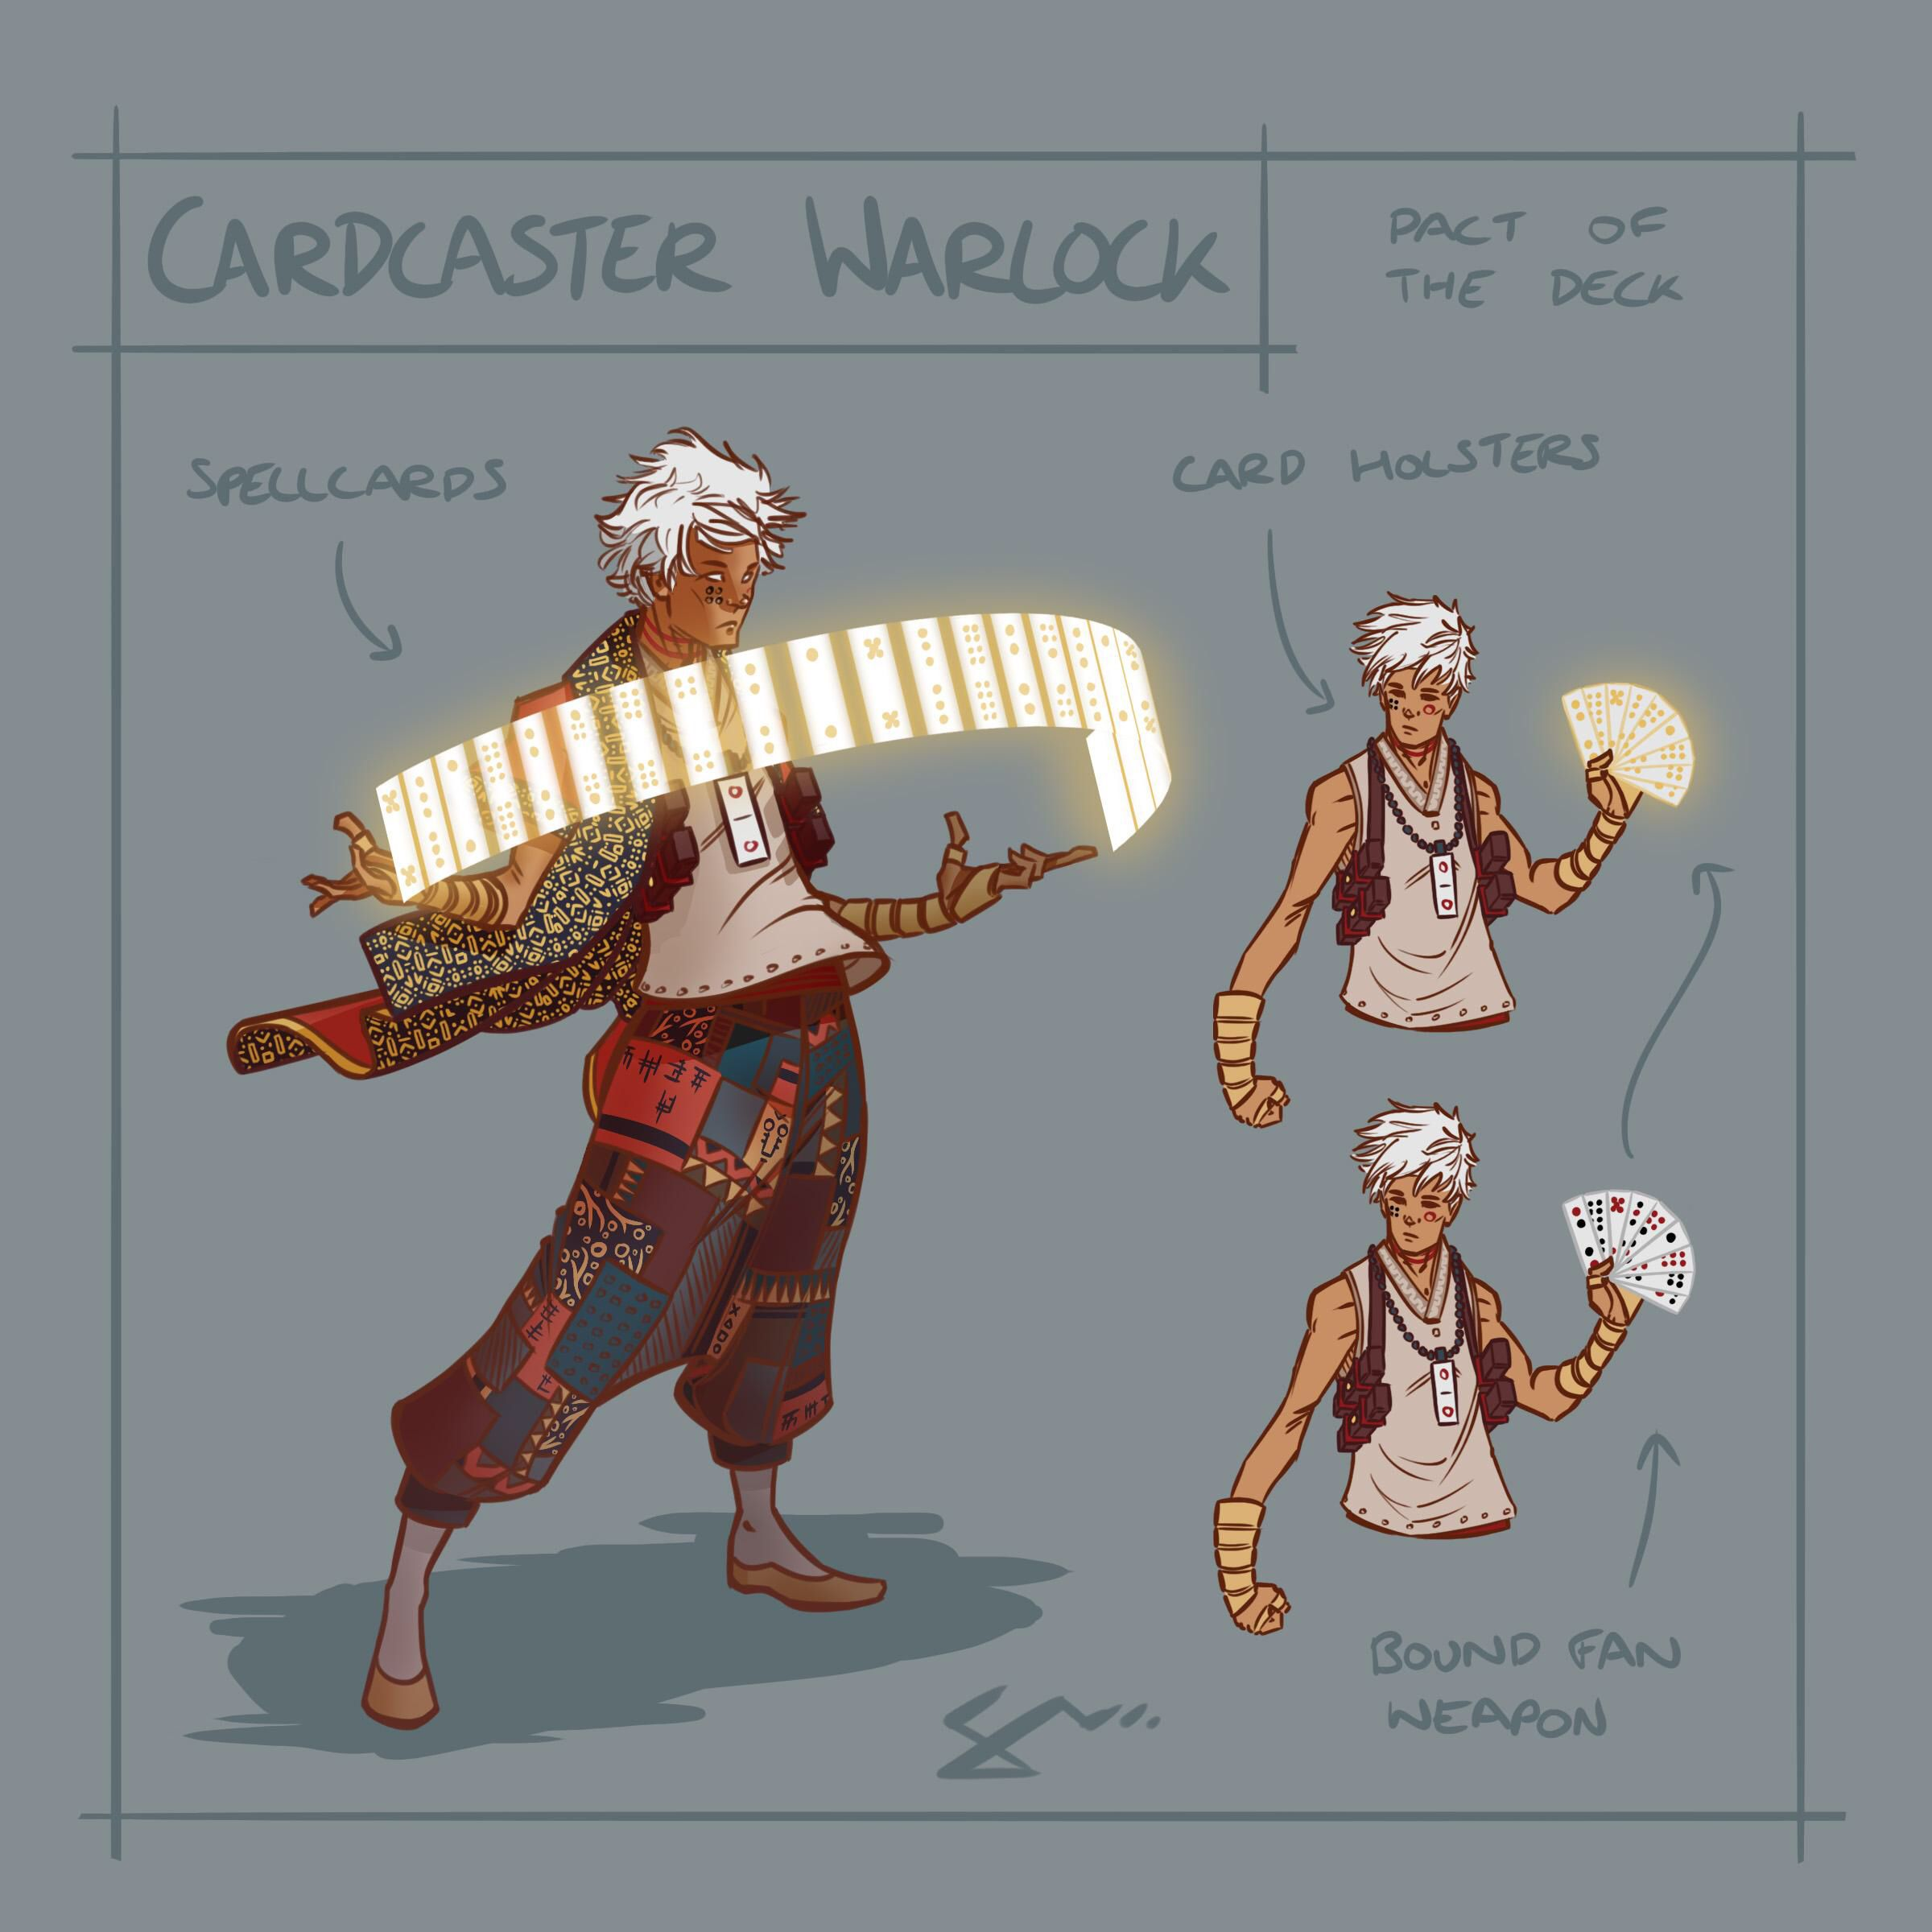 Card caster warlock Reddit | Games: D&D in 2019 | Character design